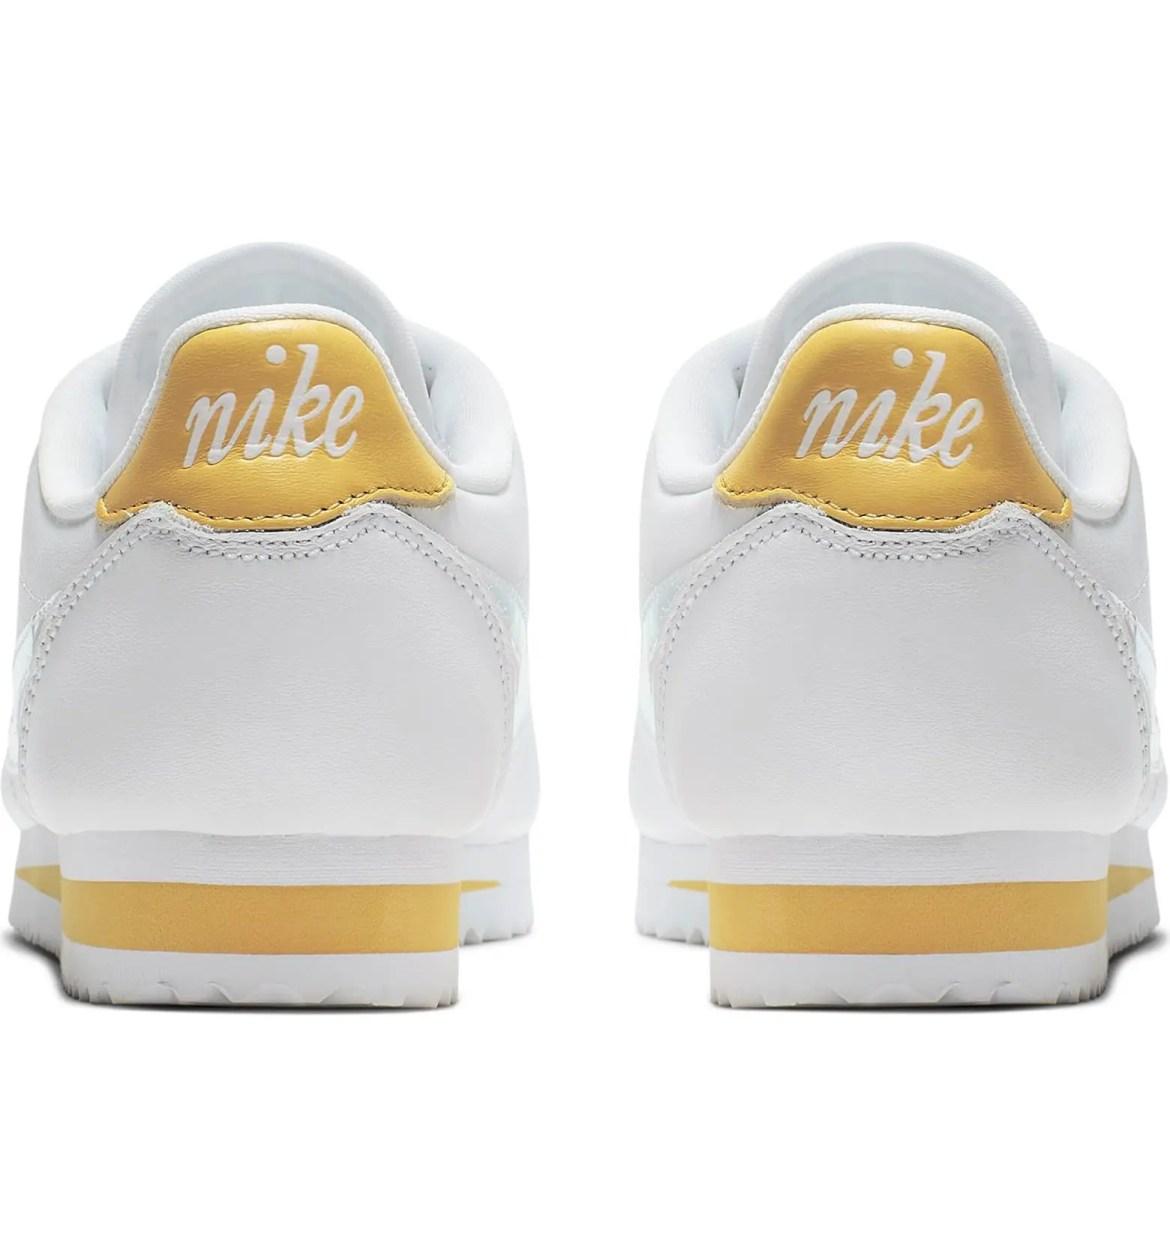 Nike Classic Cortez Sneaker White Clear Topaz Gold-02